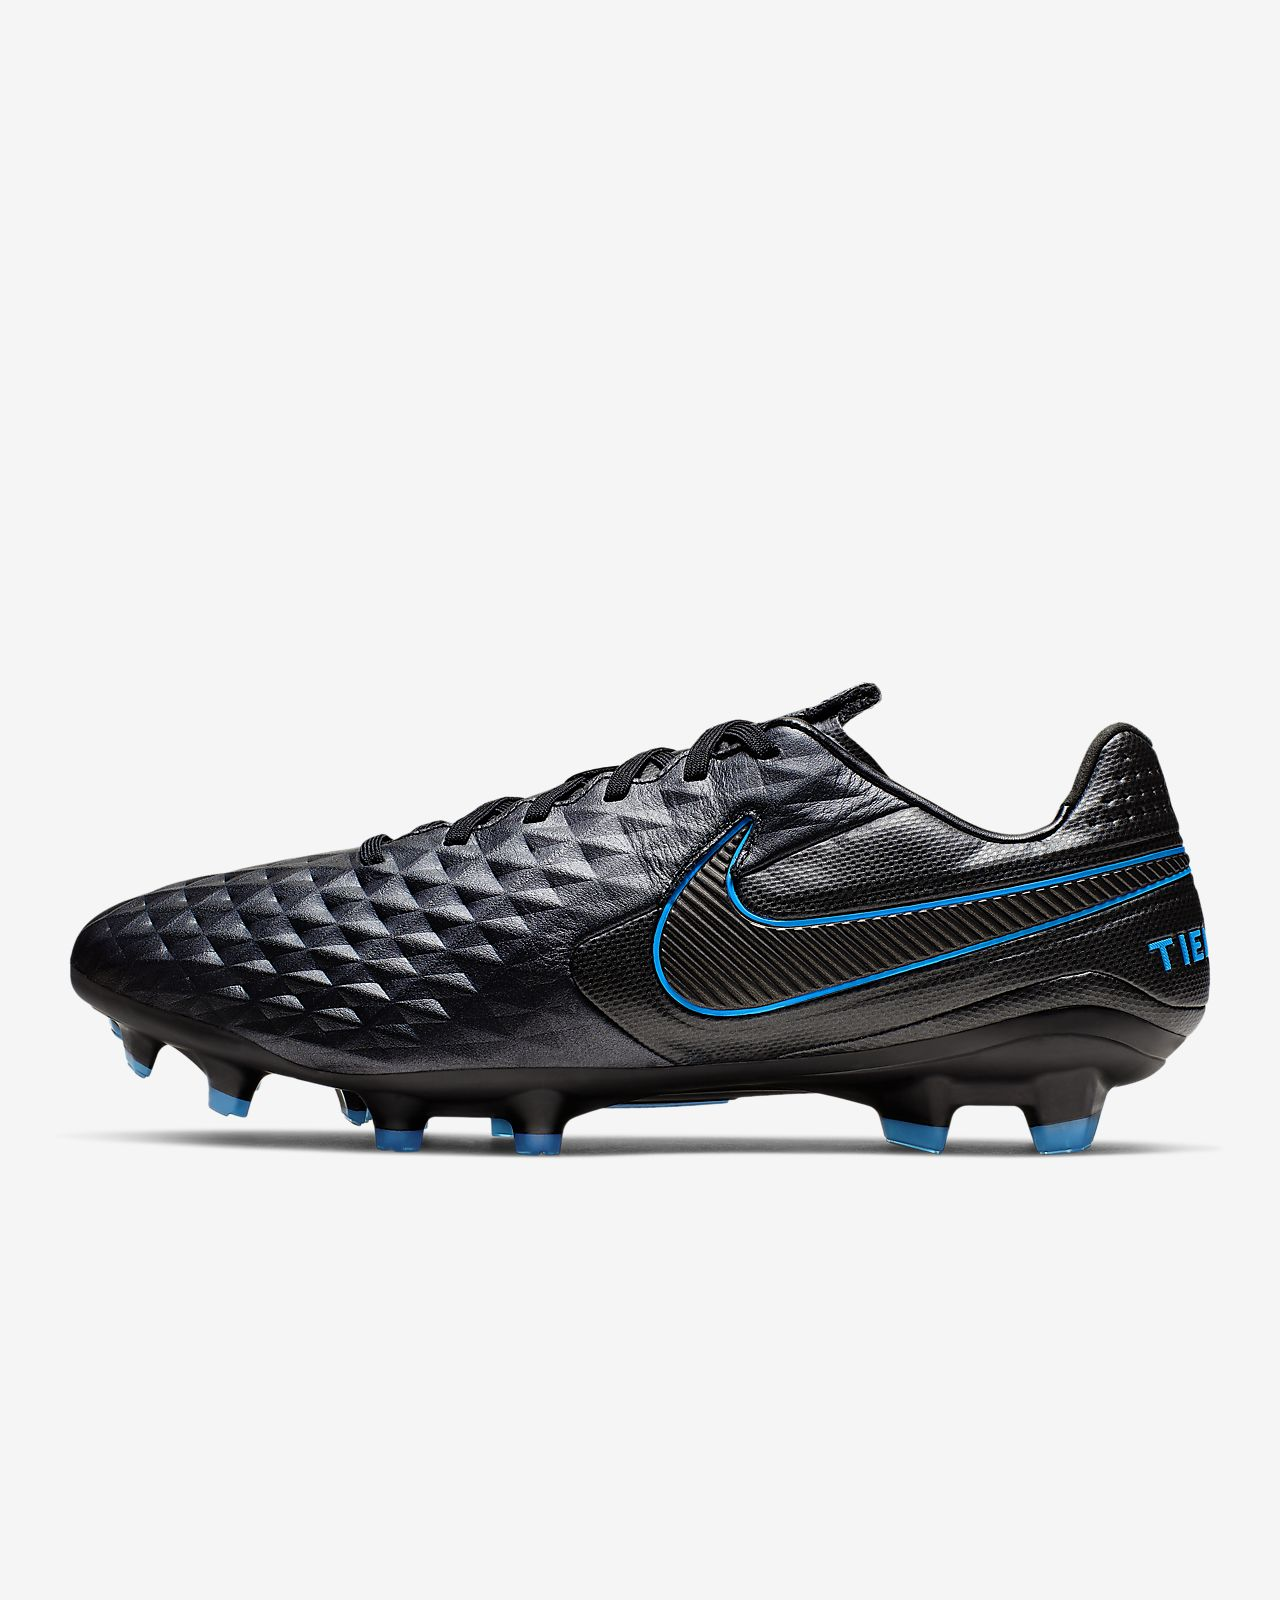 Nike Tiempo Legend 8 Pro FG Voetbalschoen (stevige ondergrond)